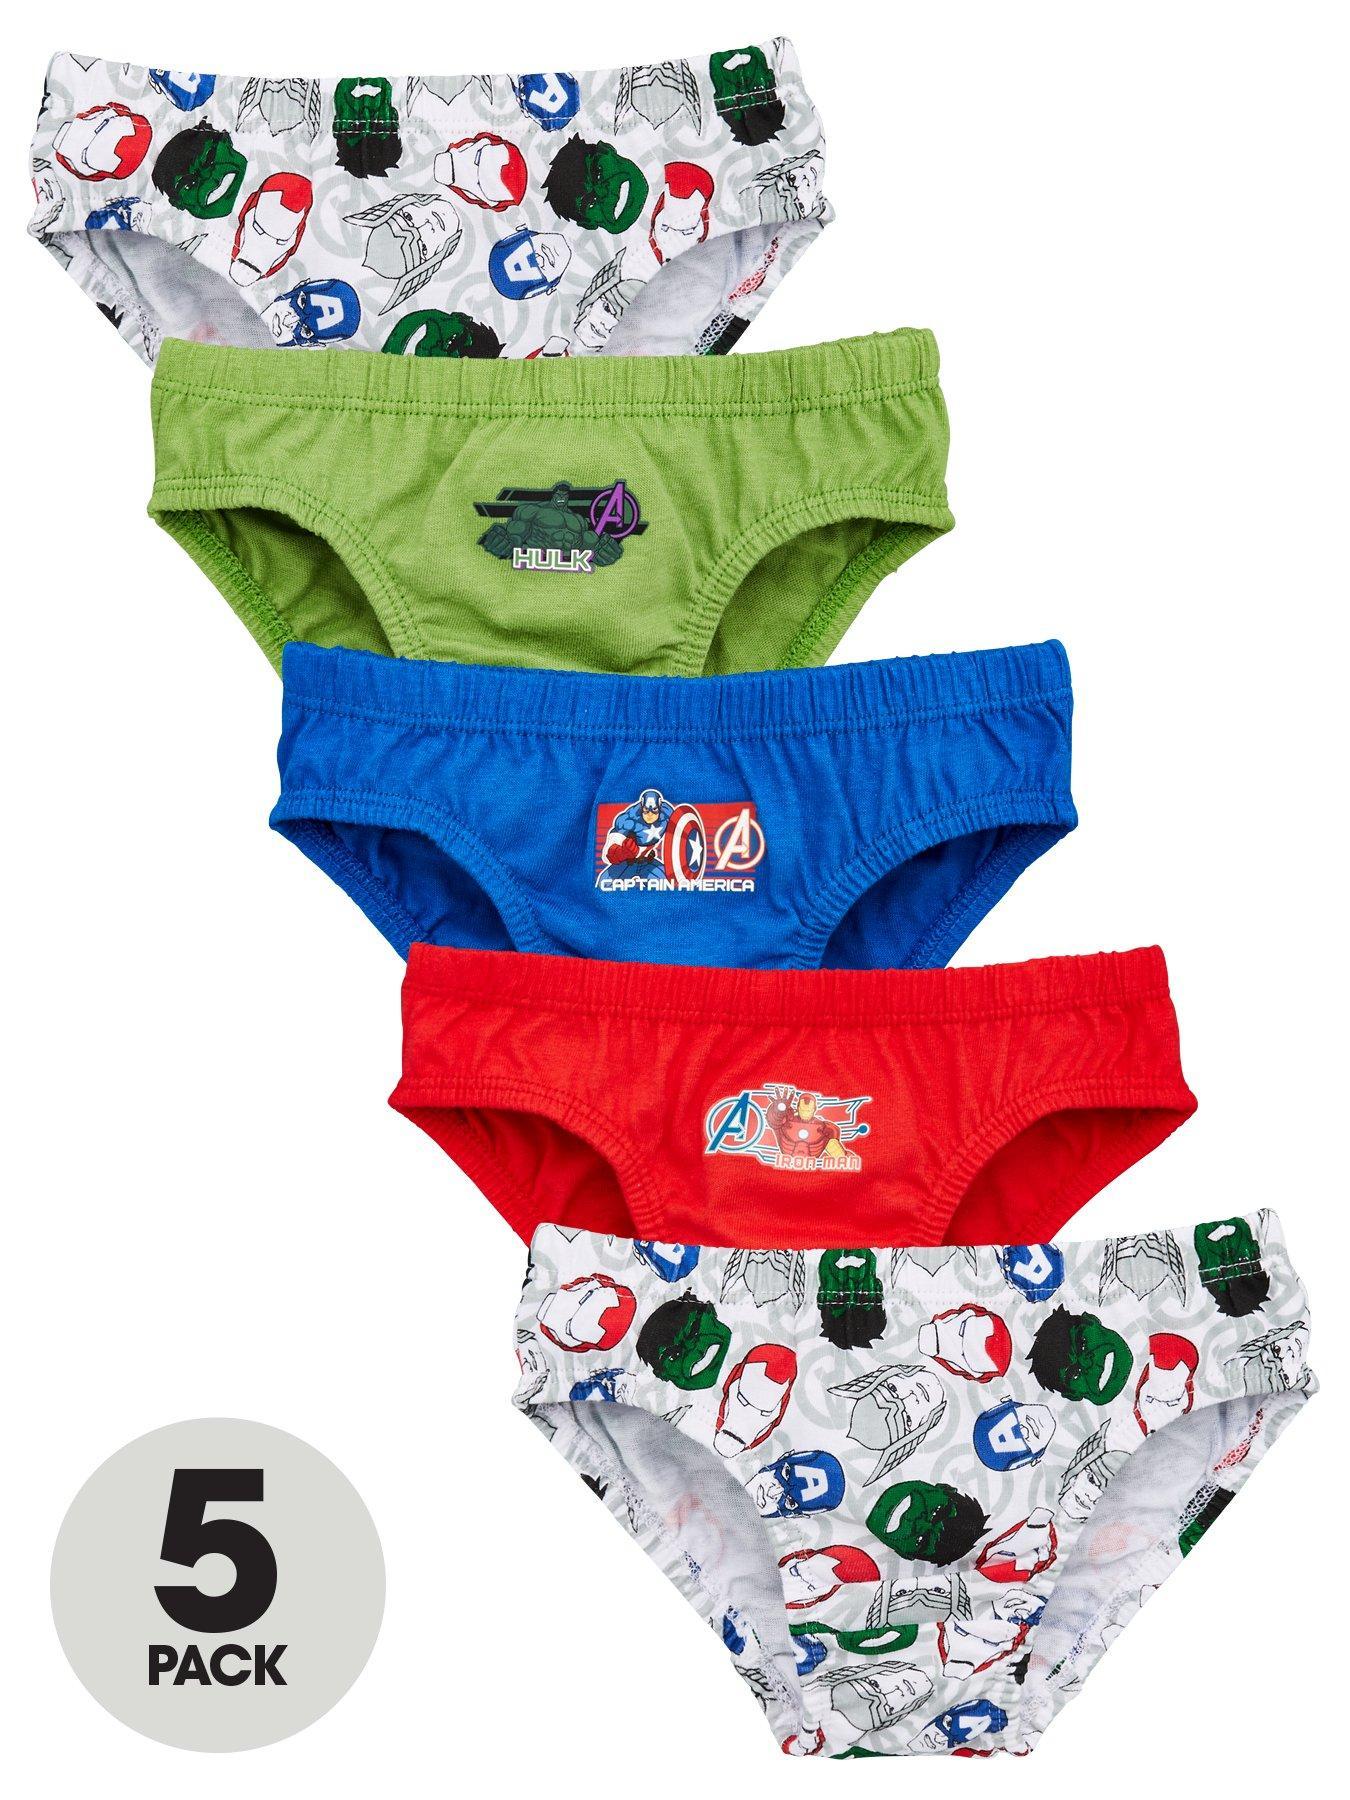 Marvel Avengers Assemble Boys 8 Pack of Briefs Underwear